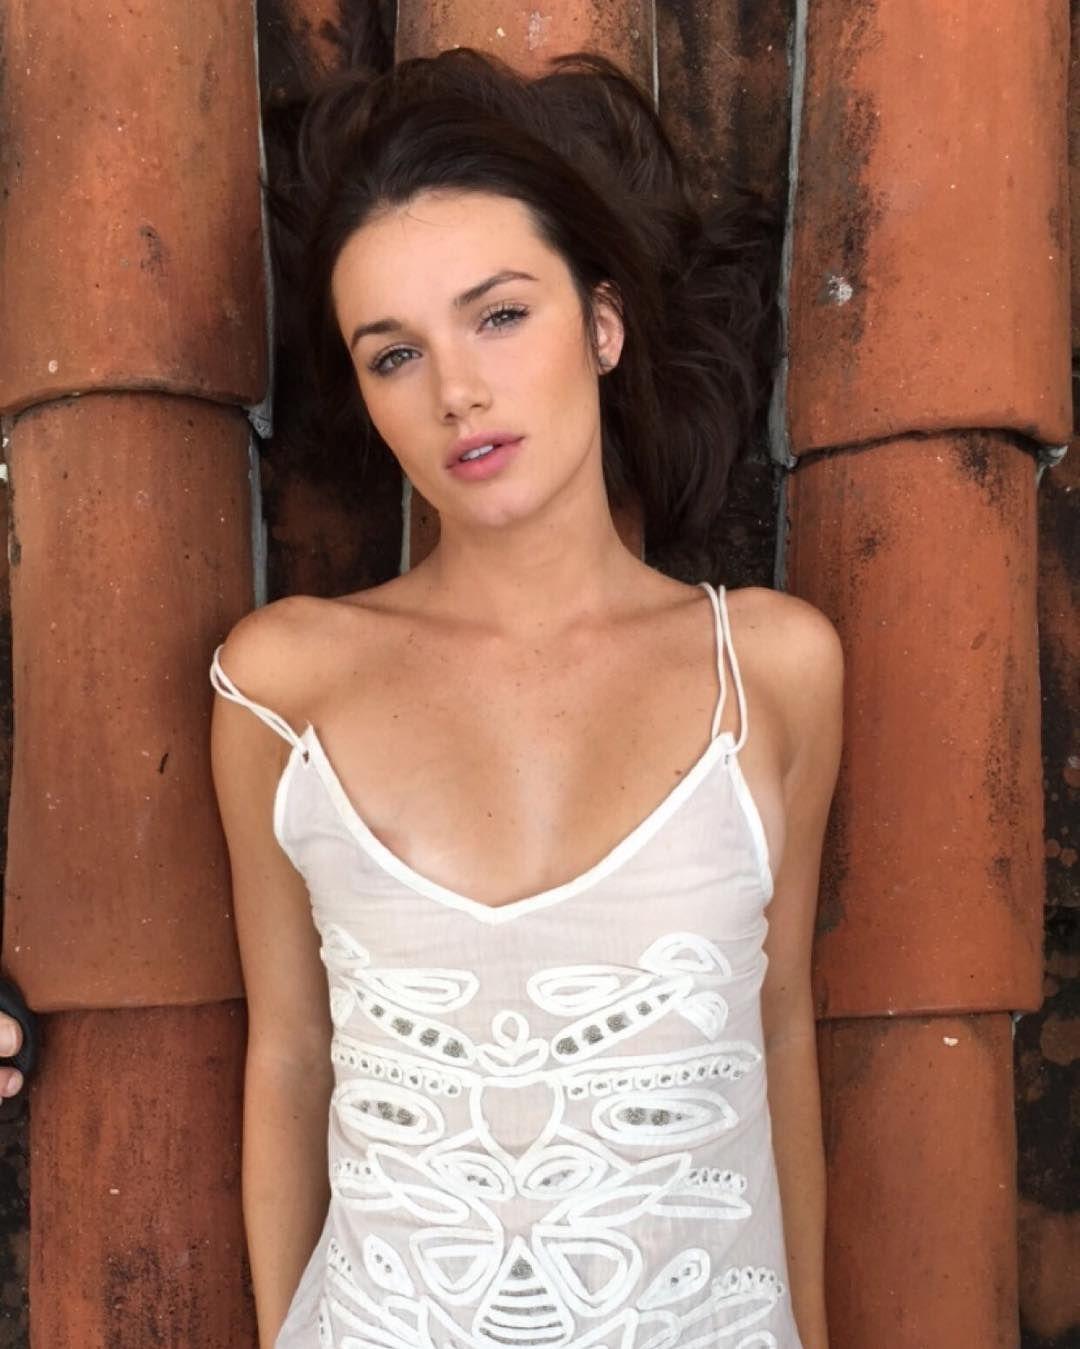 Cleavage Hailey Outland nude photos 2019